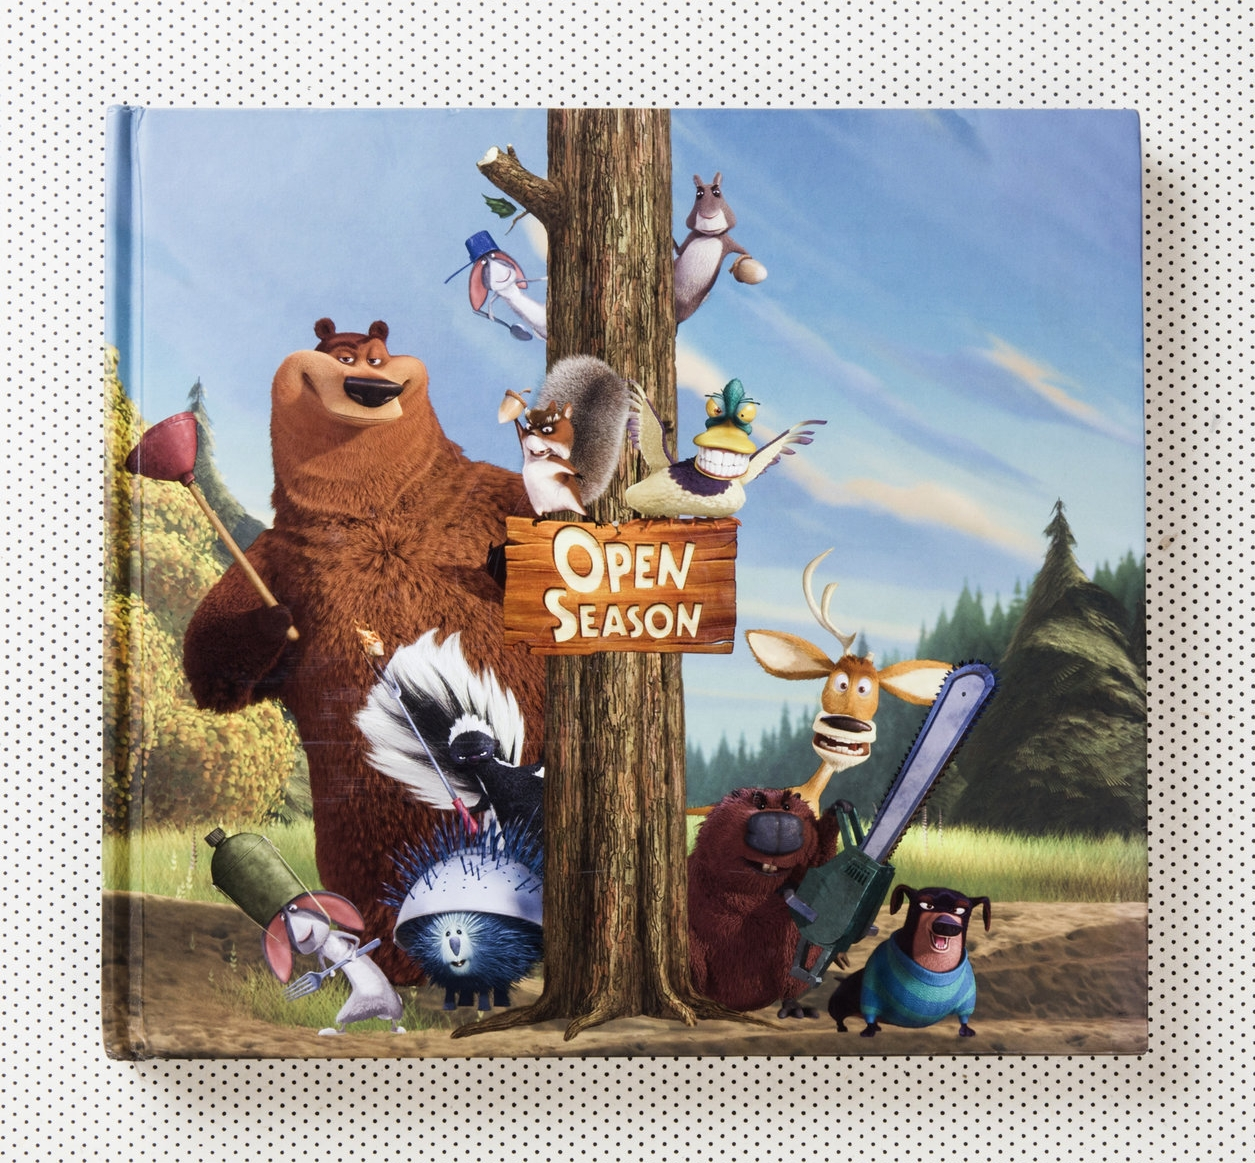 open_season_cover2.jpg